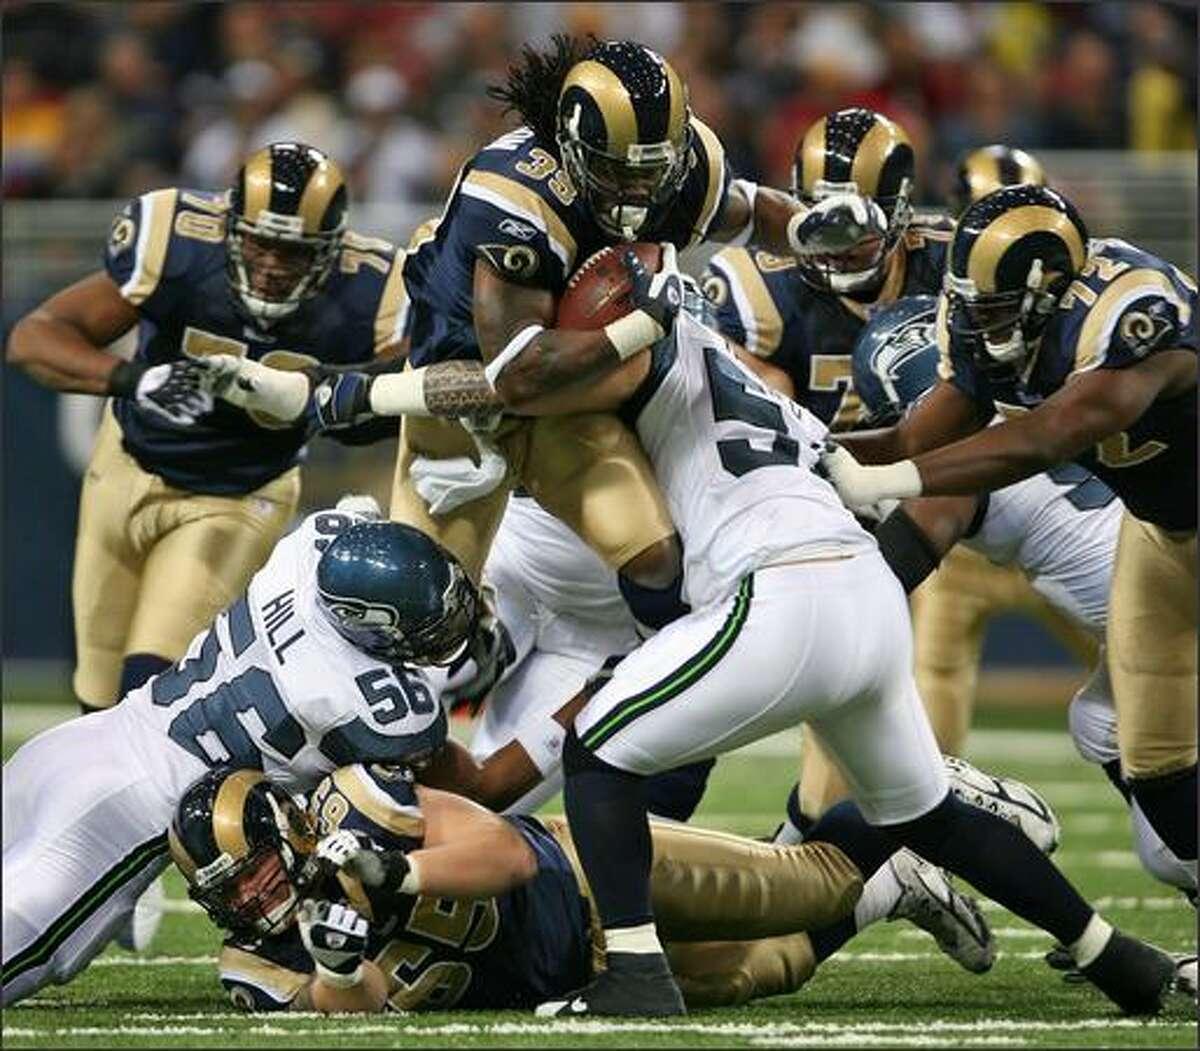 Seattle Seahawks linebacker LeRoy Hill (56) and linebacker Lofa Tatupu (51) get a grip on St. Louis Rams running back Steven Jackson during the first quarter.